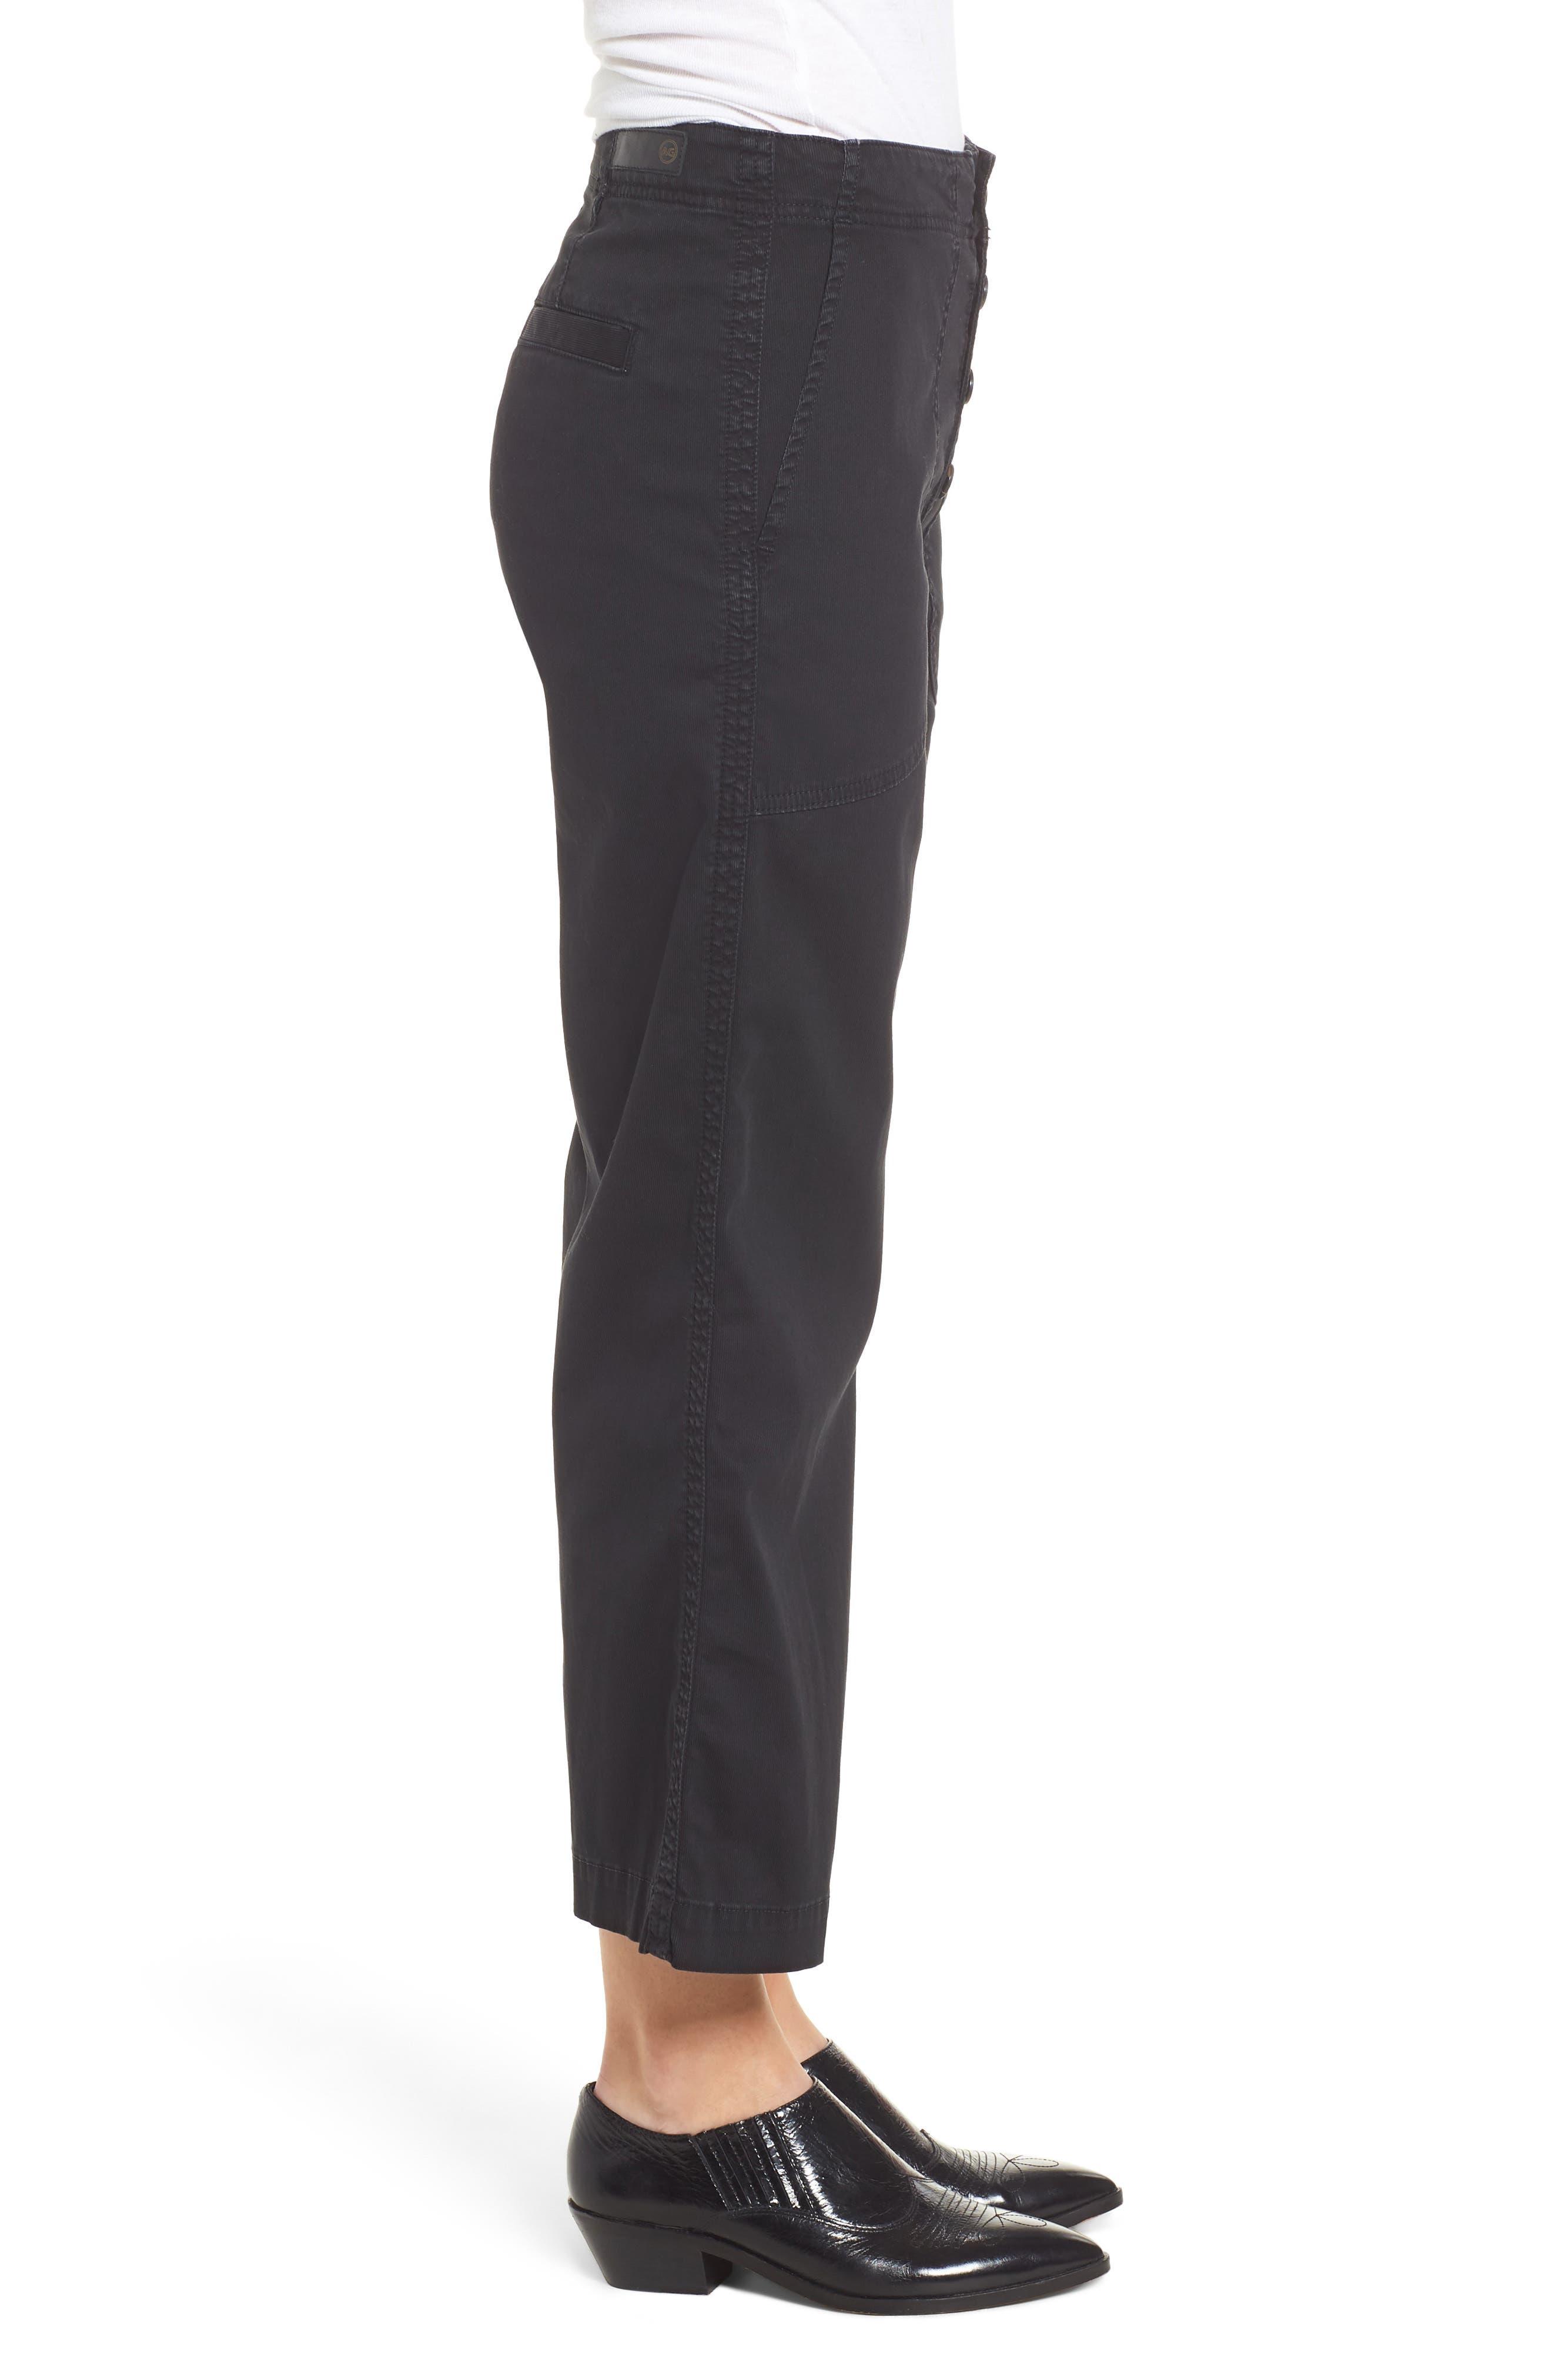 Etta High Waist Crop Wide Leg Jeans,                             Alternate thumbnail 3, color,                             SULFUR SUPER BLACK